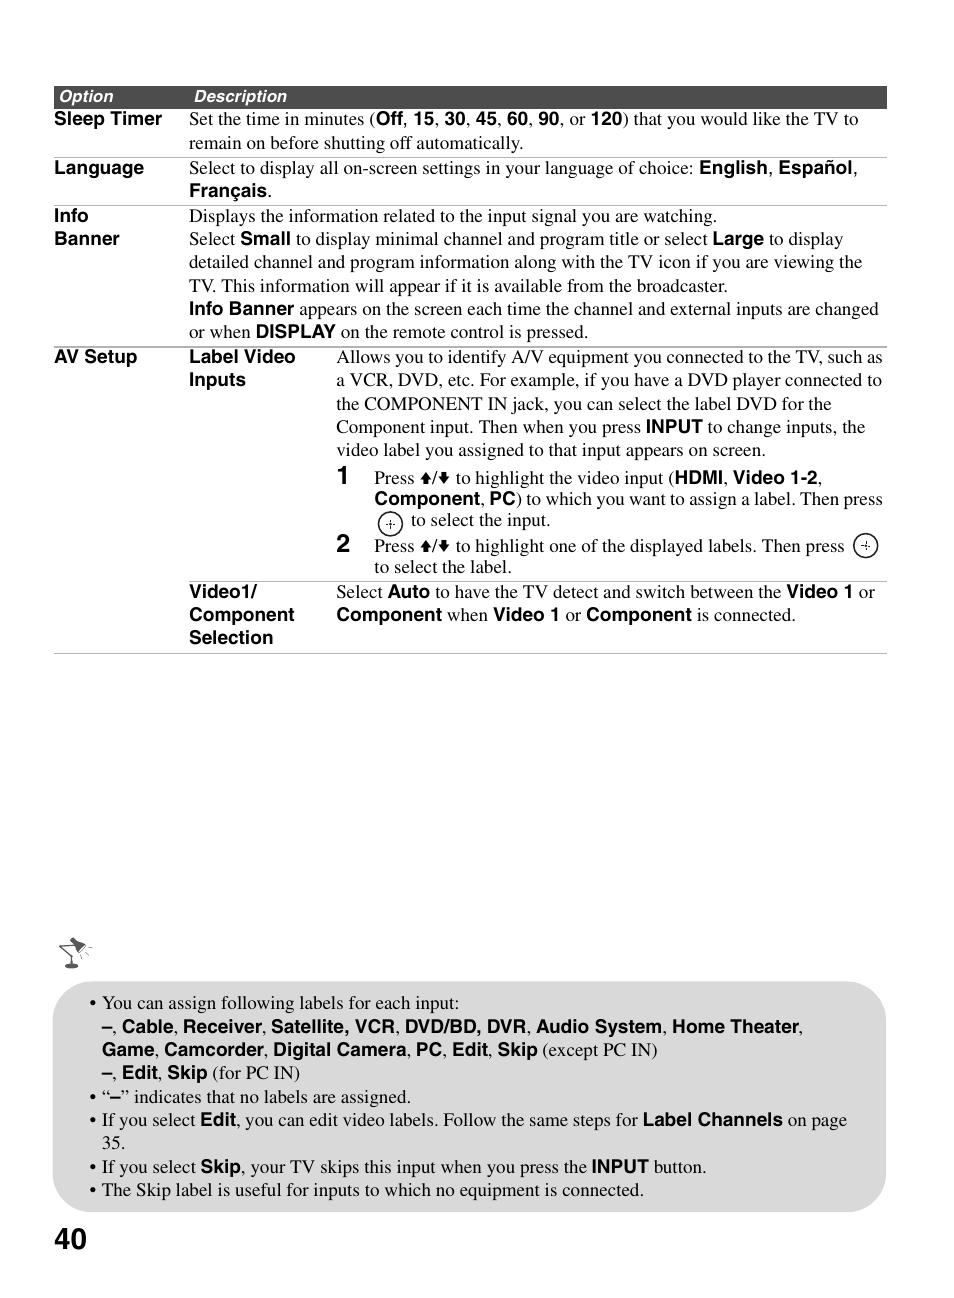 sony bravia kdl 22bx321 user manual page 40 64 original mode rh manualsdir com